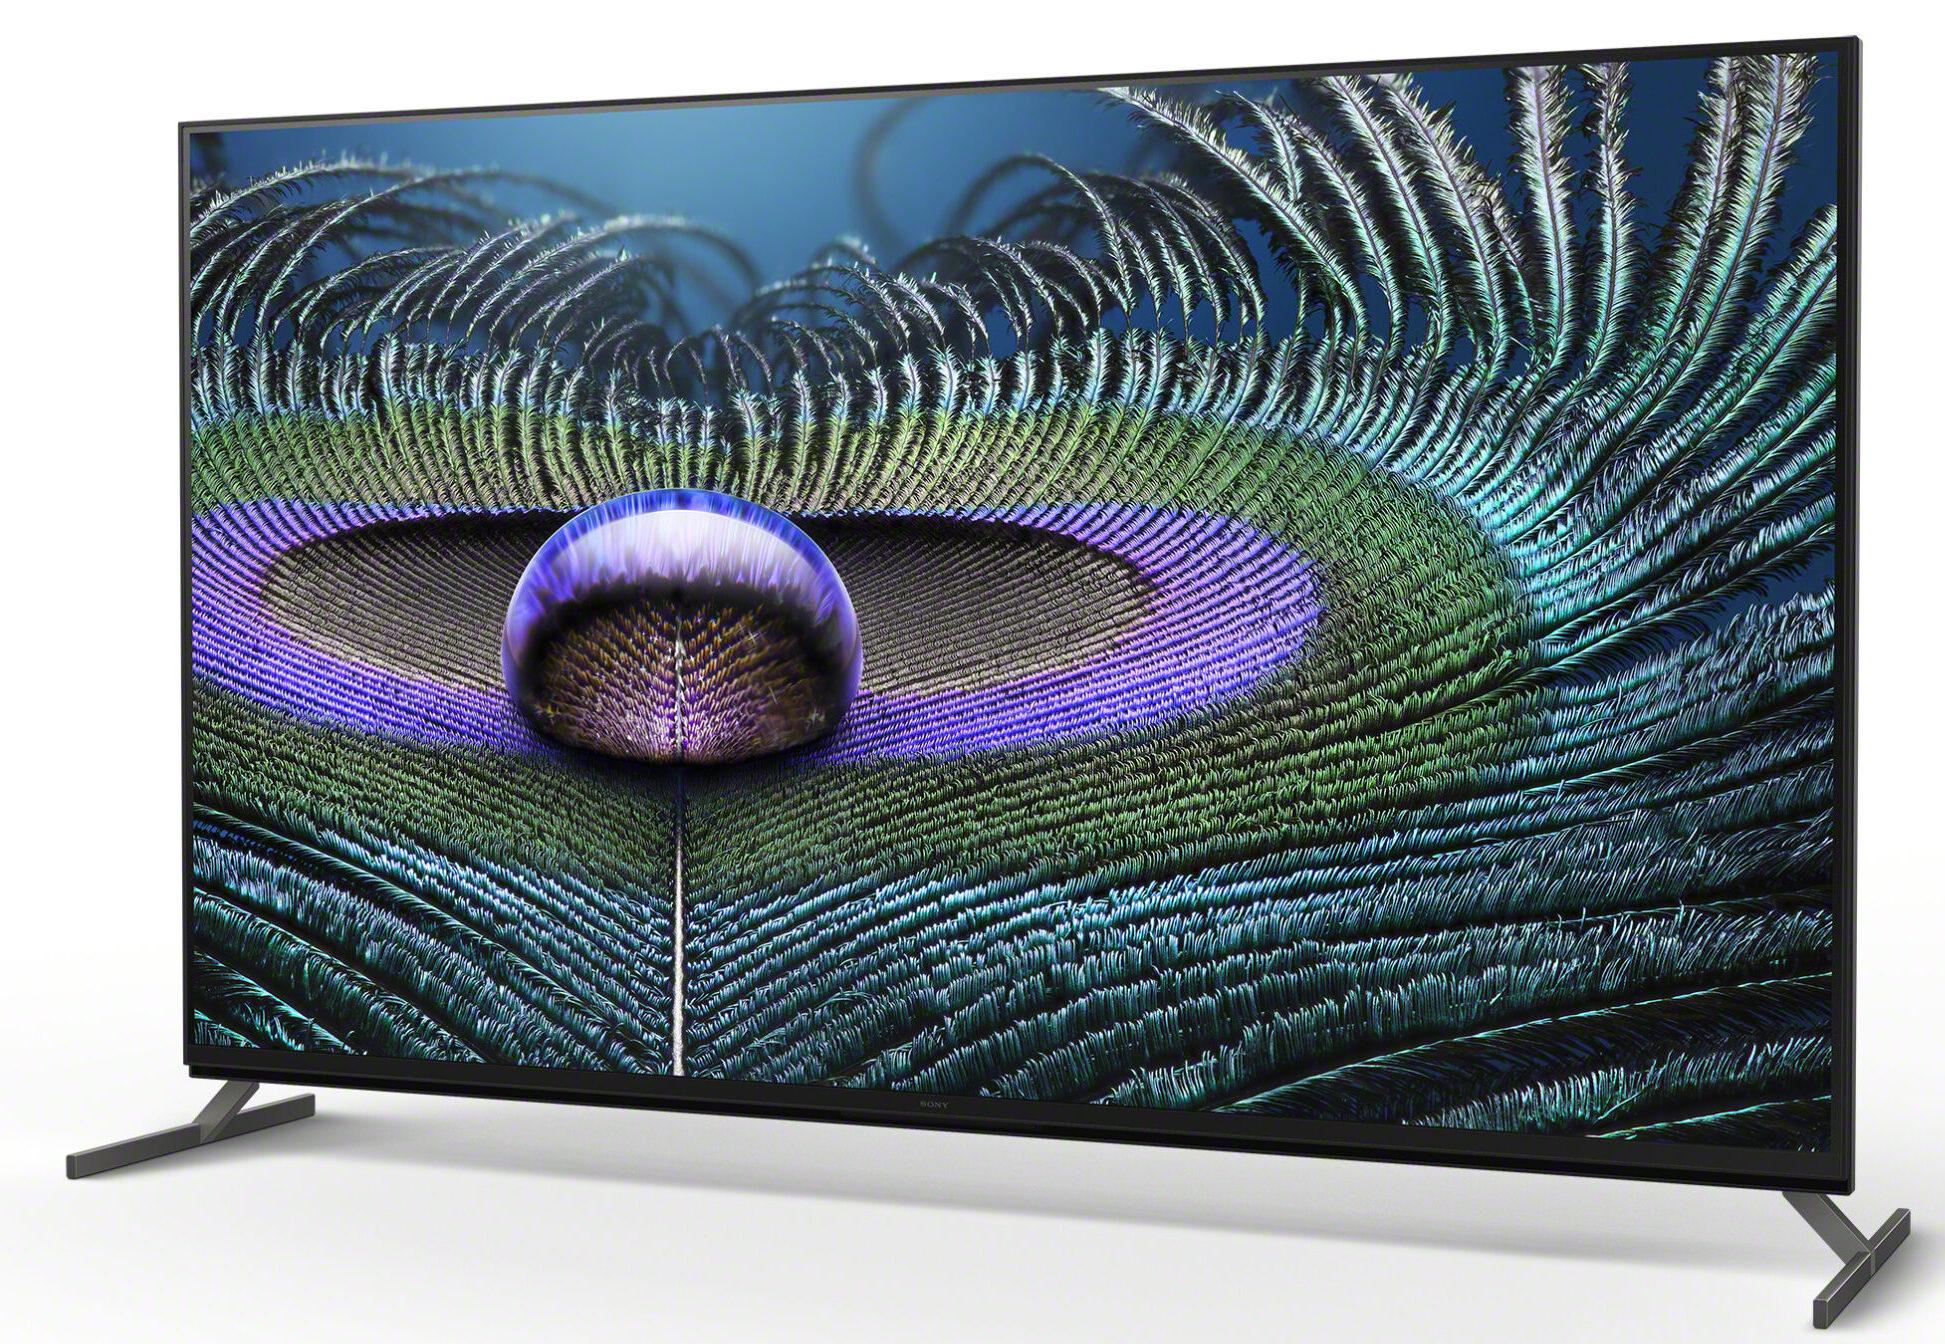 Sony annuncia i nuovi TV BRAVIA XR 8K LED, 4K OLED e 4K LED con Cognitive Processor XR